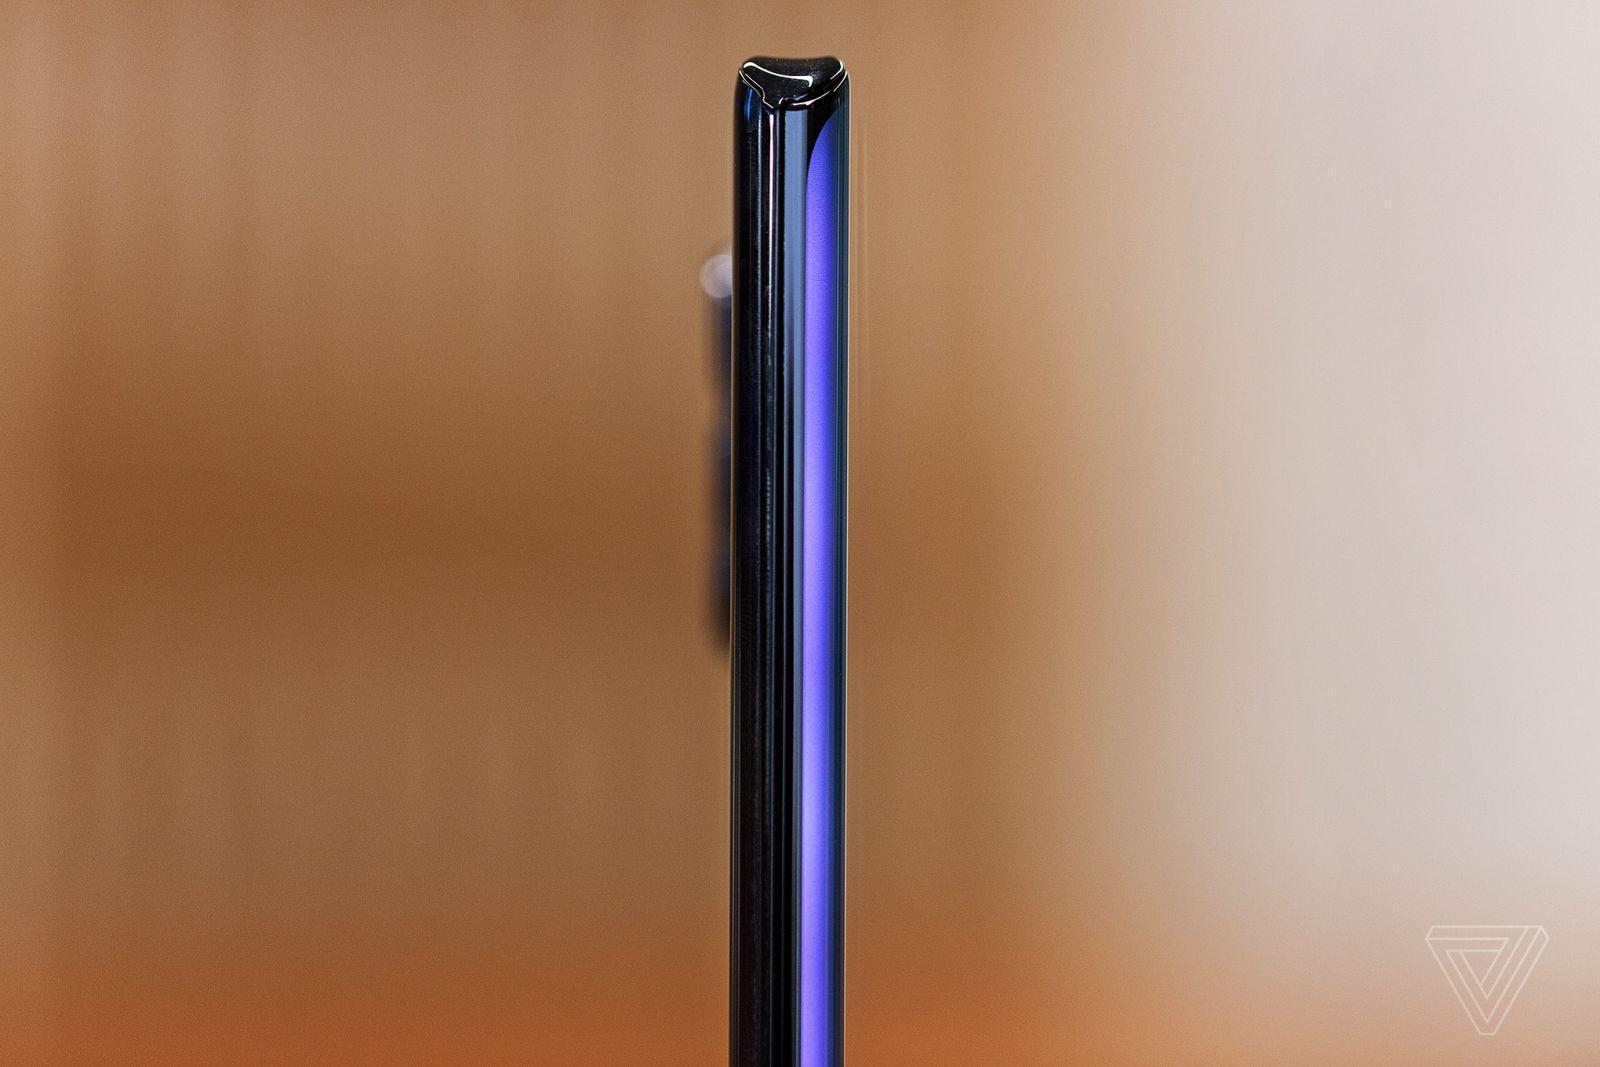 Motorola представила флагманский смартфон Motorola Edge Plus